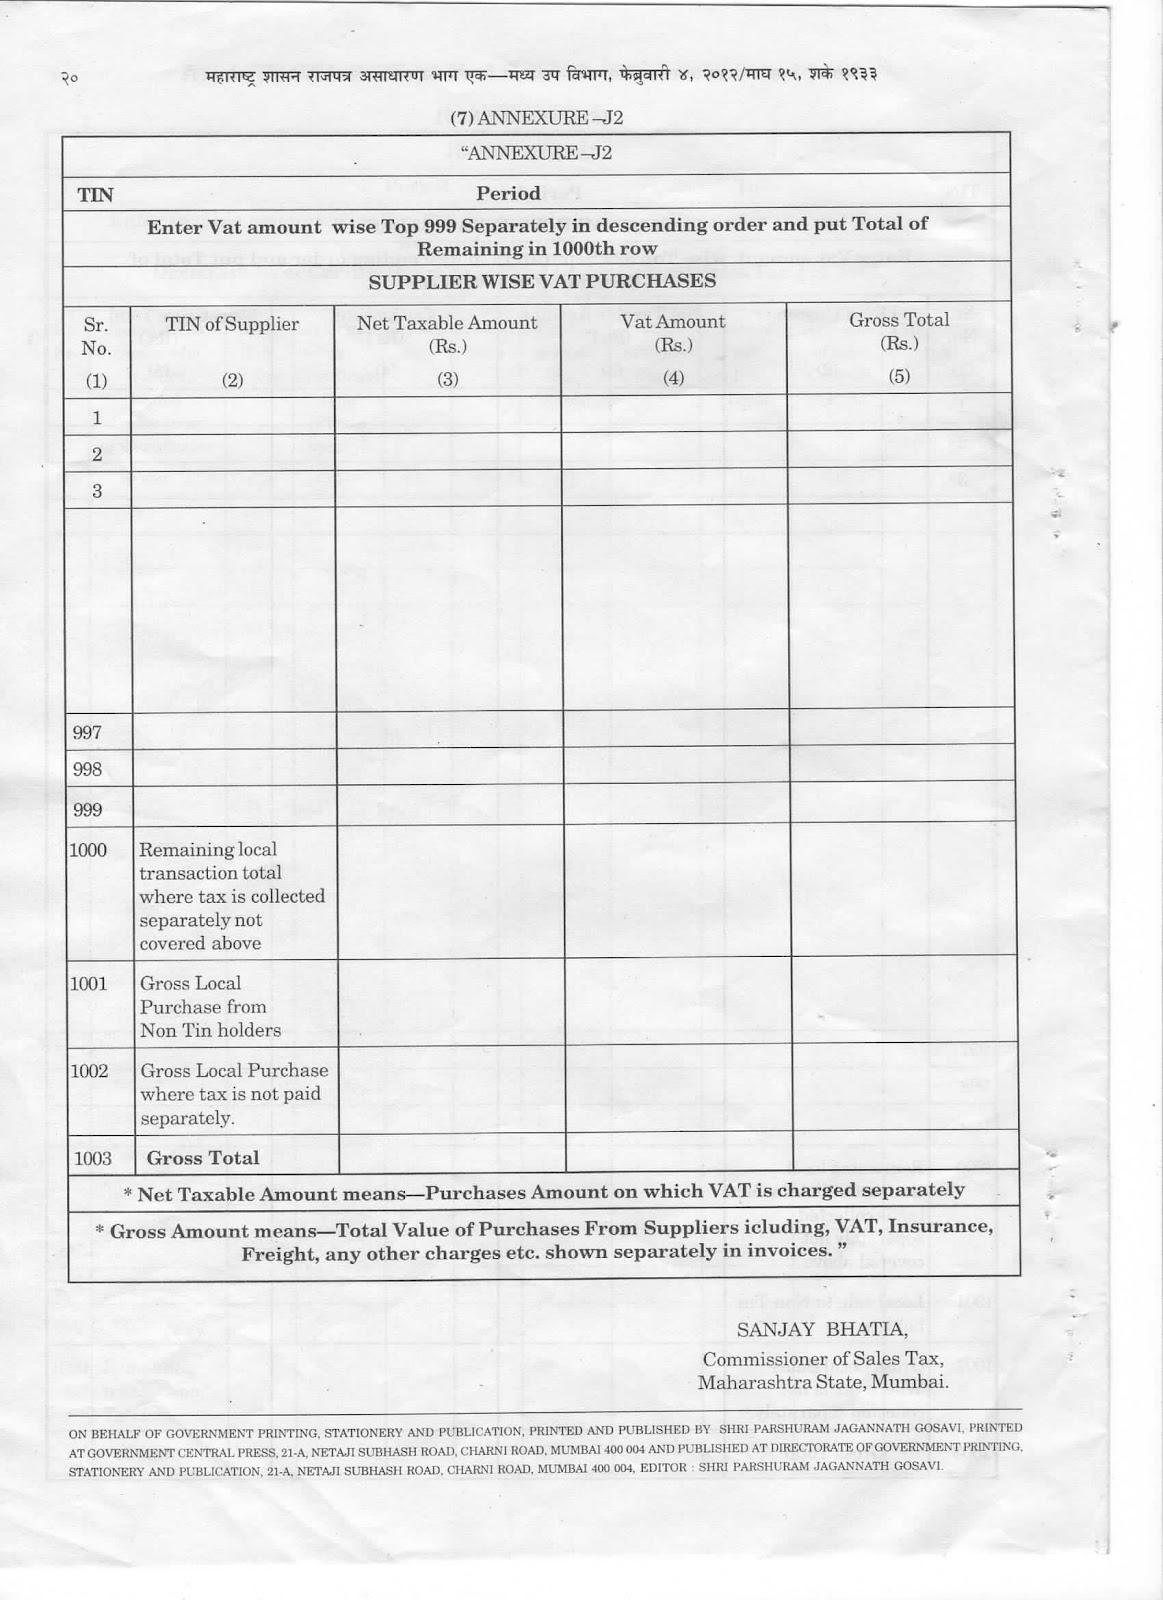 Ca Kamal Gangaramani B Com Fca Disa Icai Form 704 Annexure J2